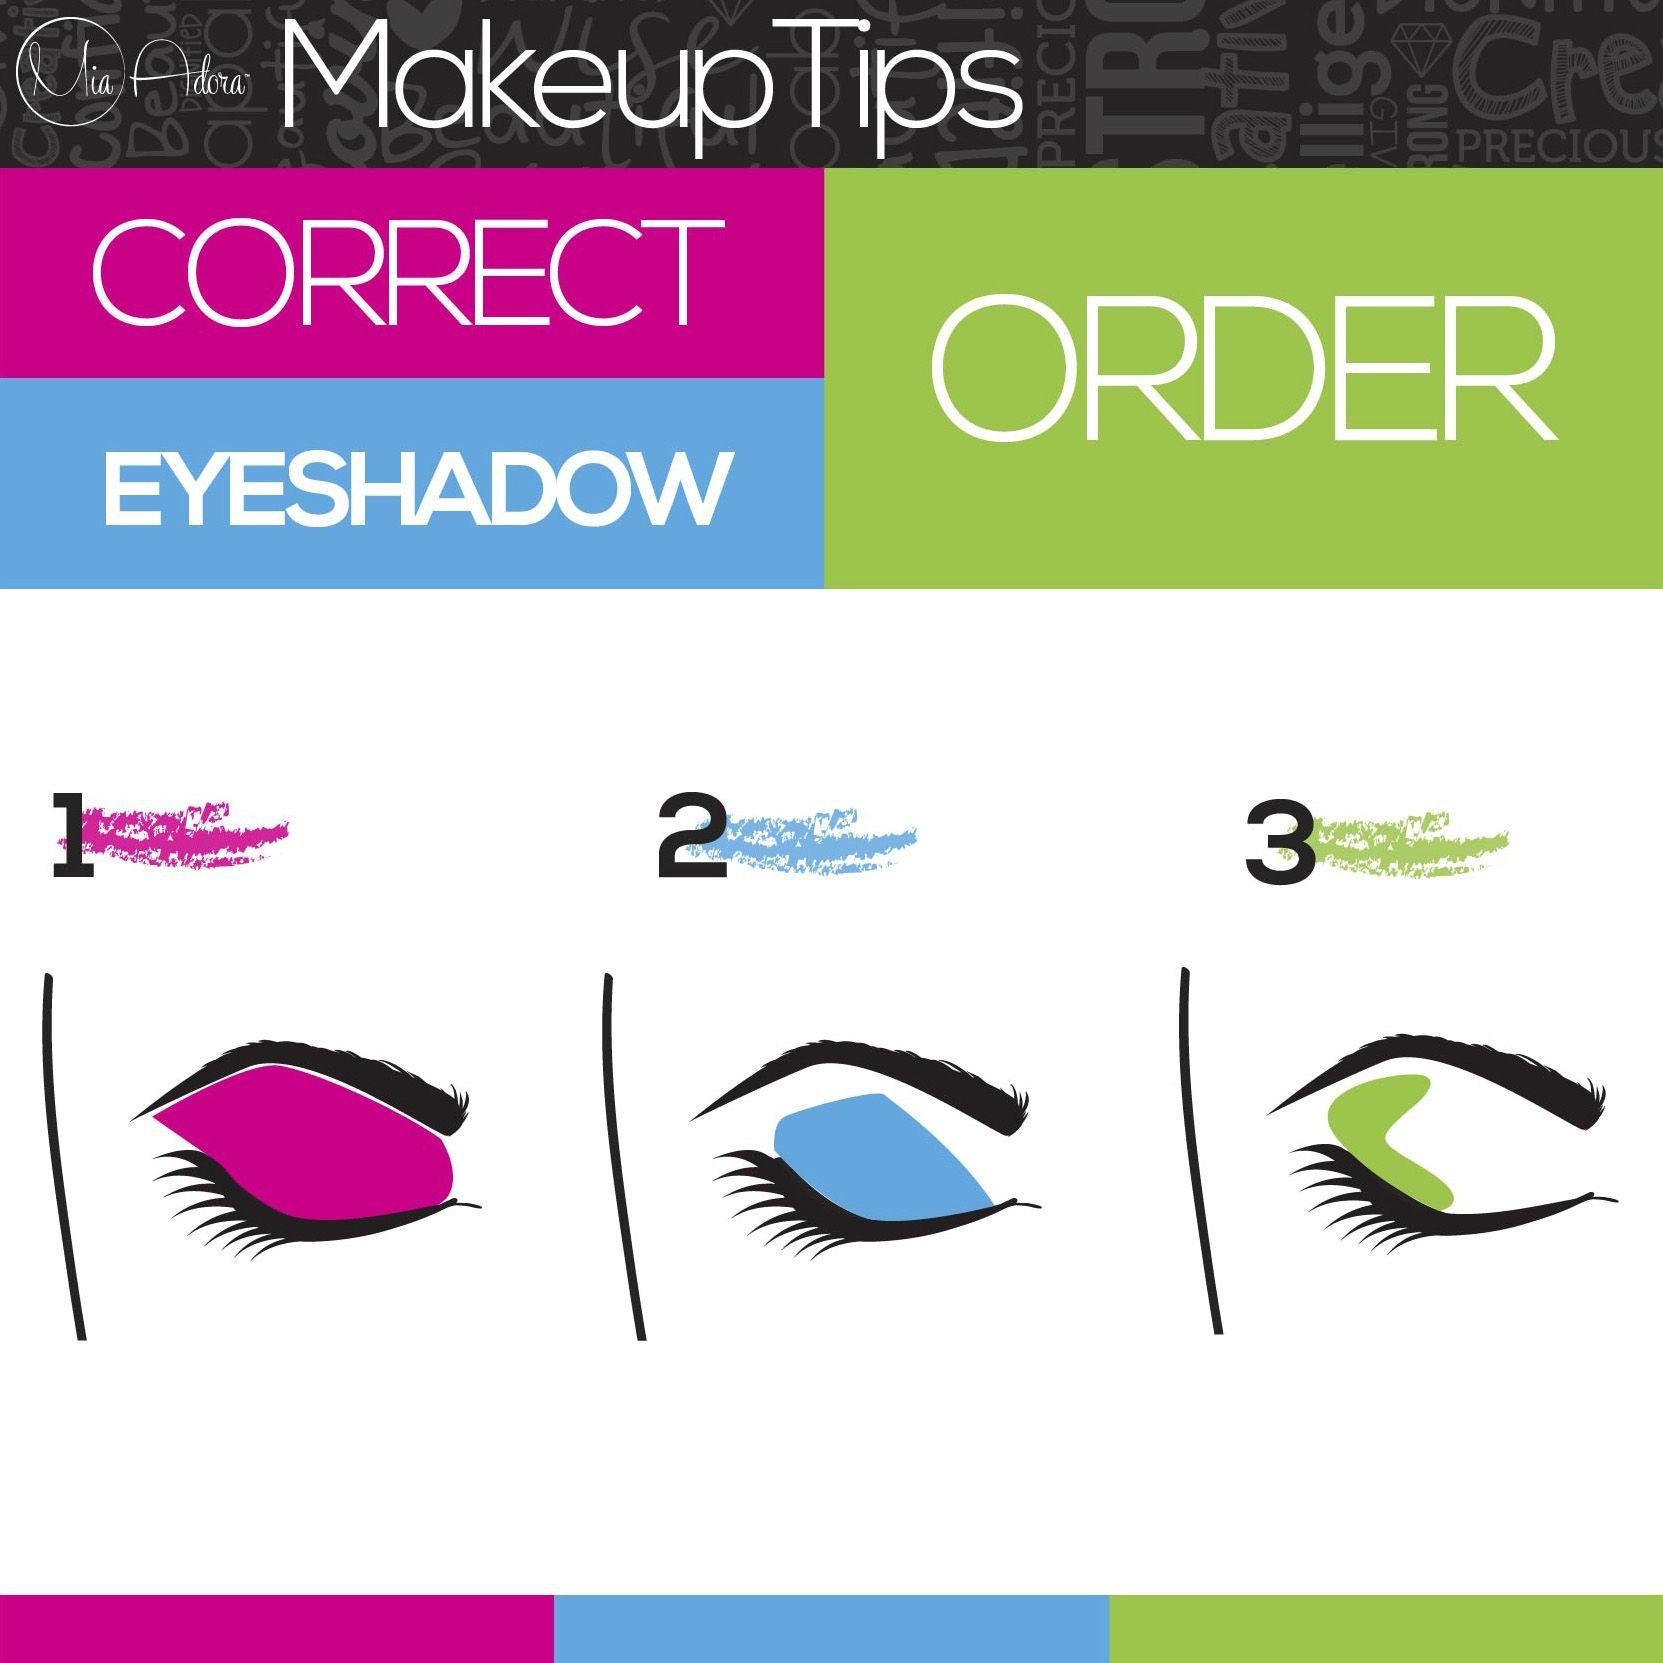 Correct Eyeshadow Order 1 Lightest Color 2 Medium Shade